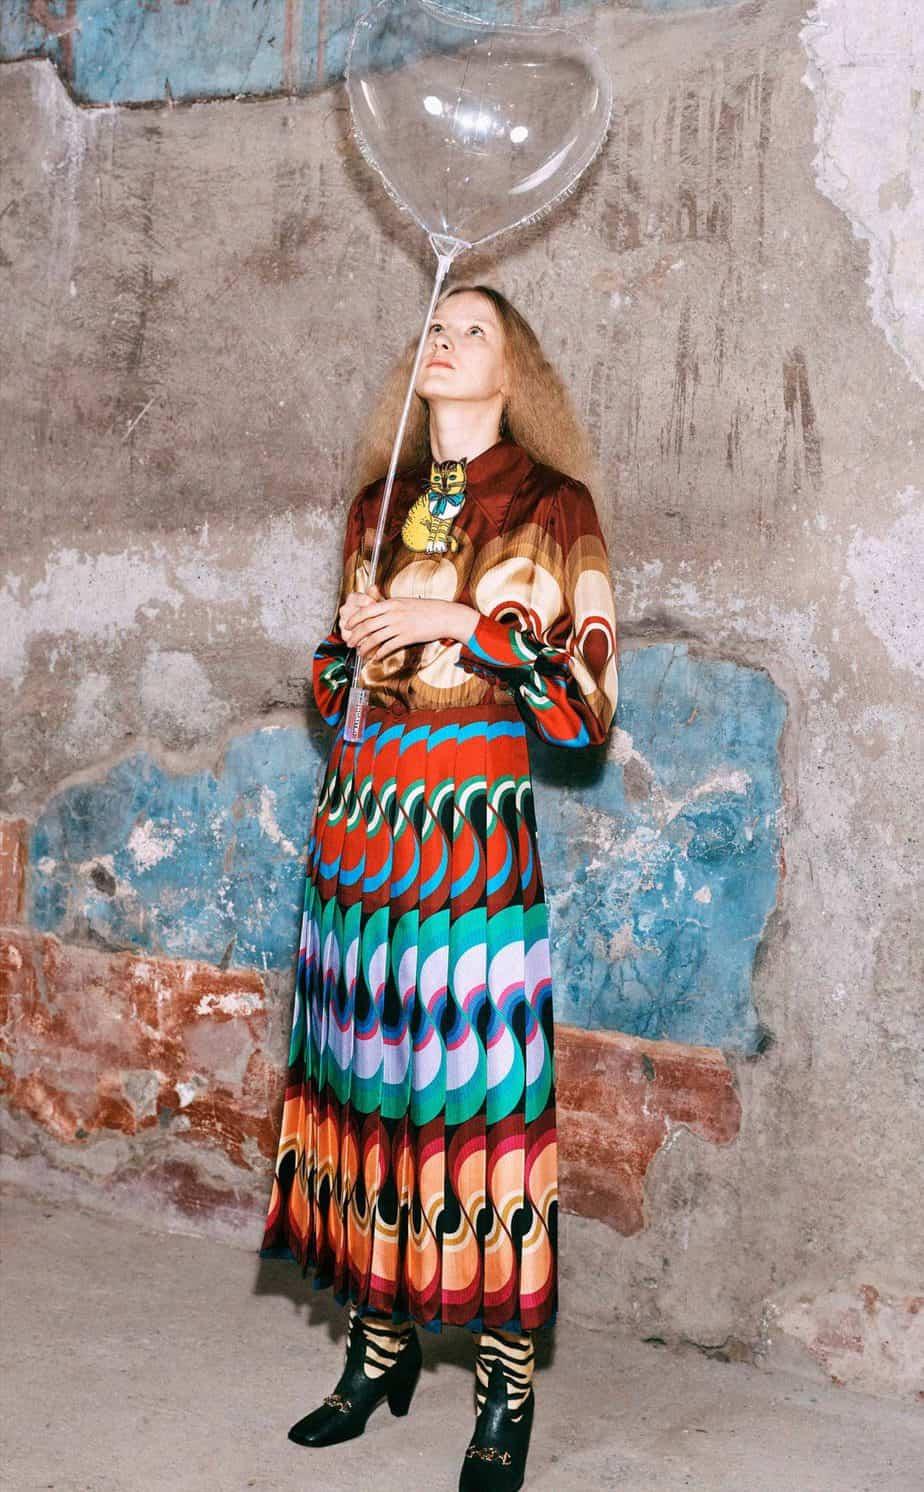 GUCCI, FALL 2019. WOMEN'S FASHION, Photographer Harmony Korine, Art Director, Christopher Simmonds - 62